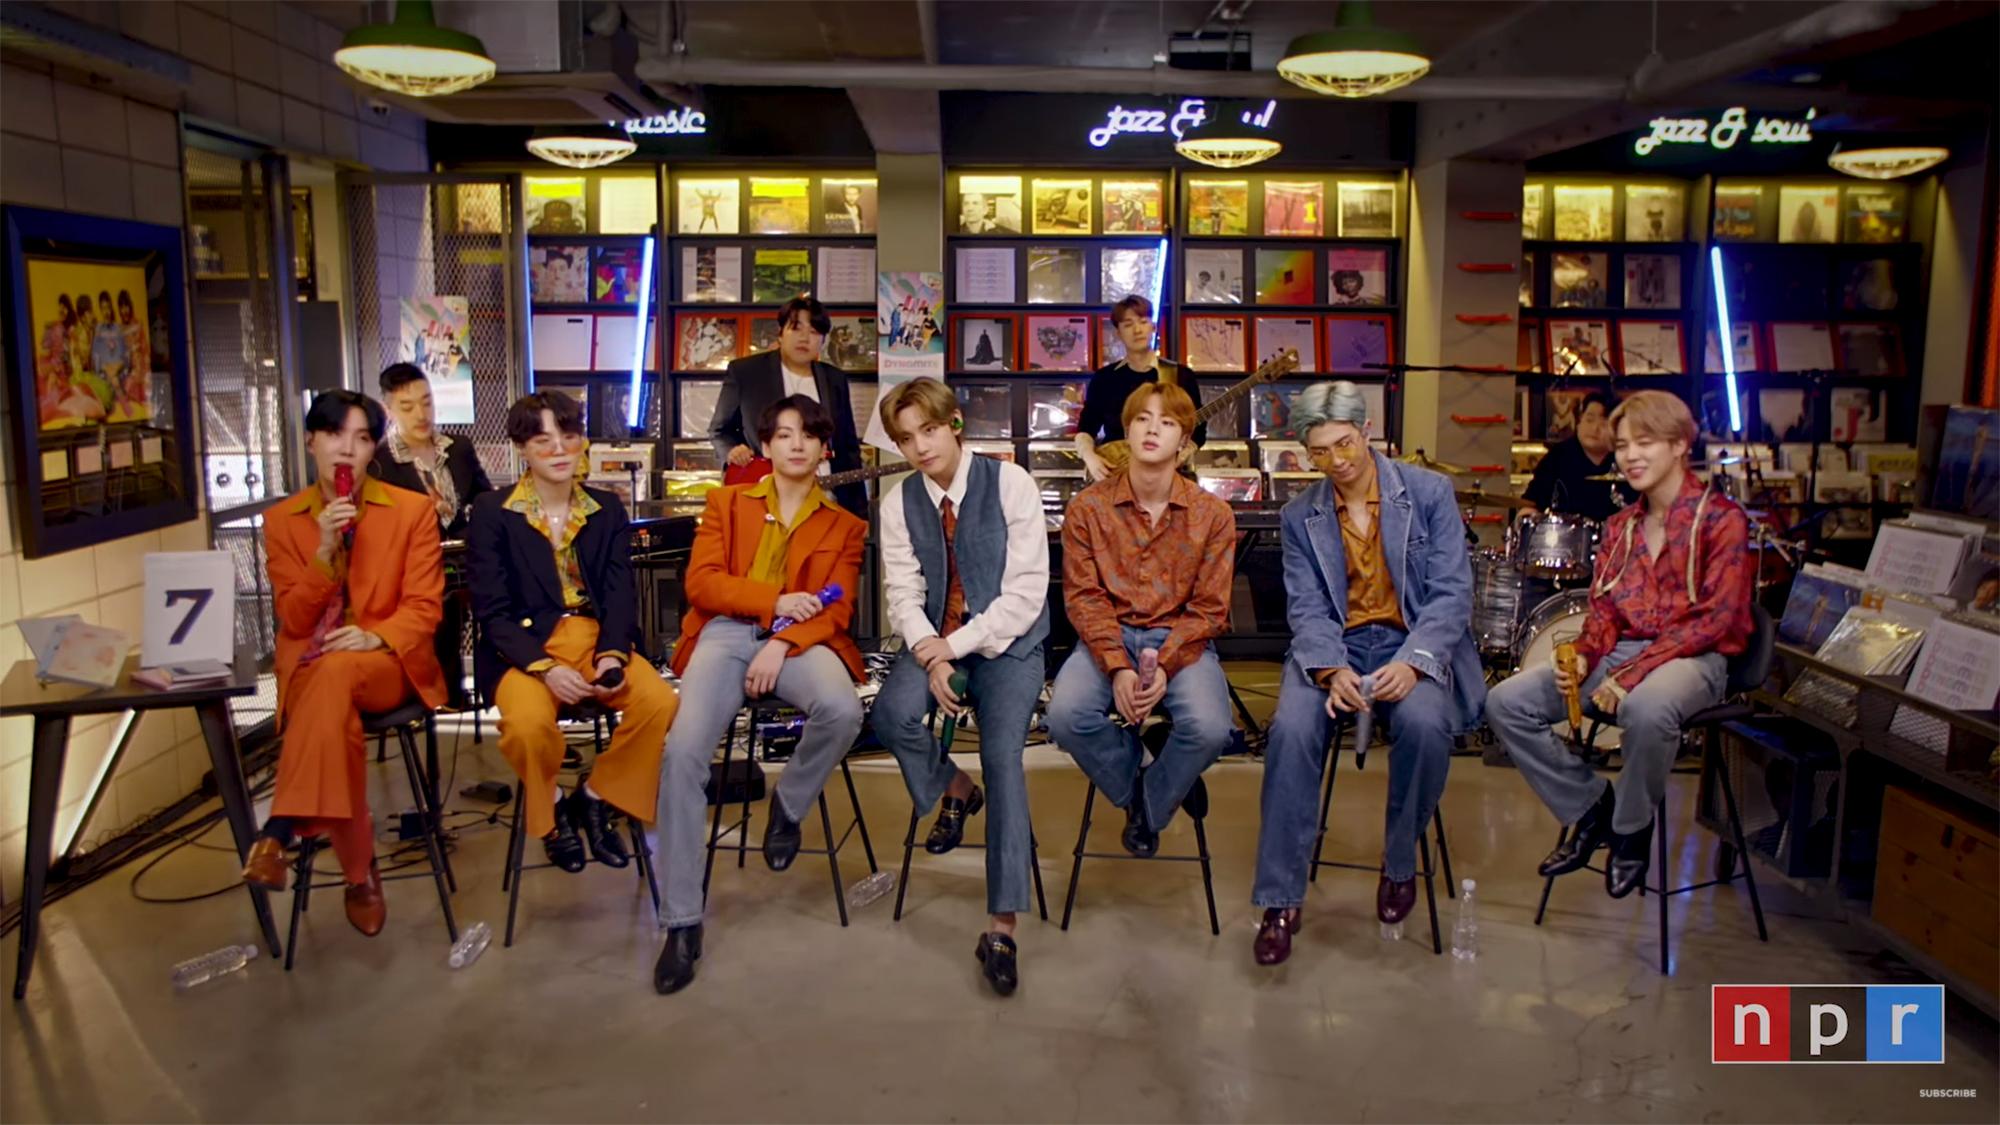 BTS Tiny desk concert